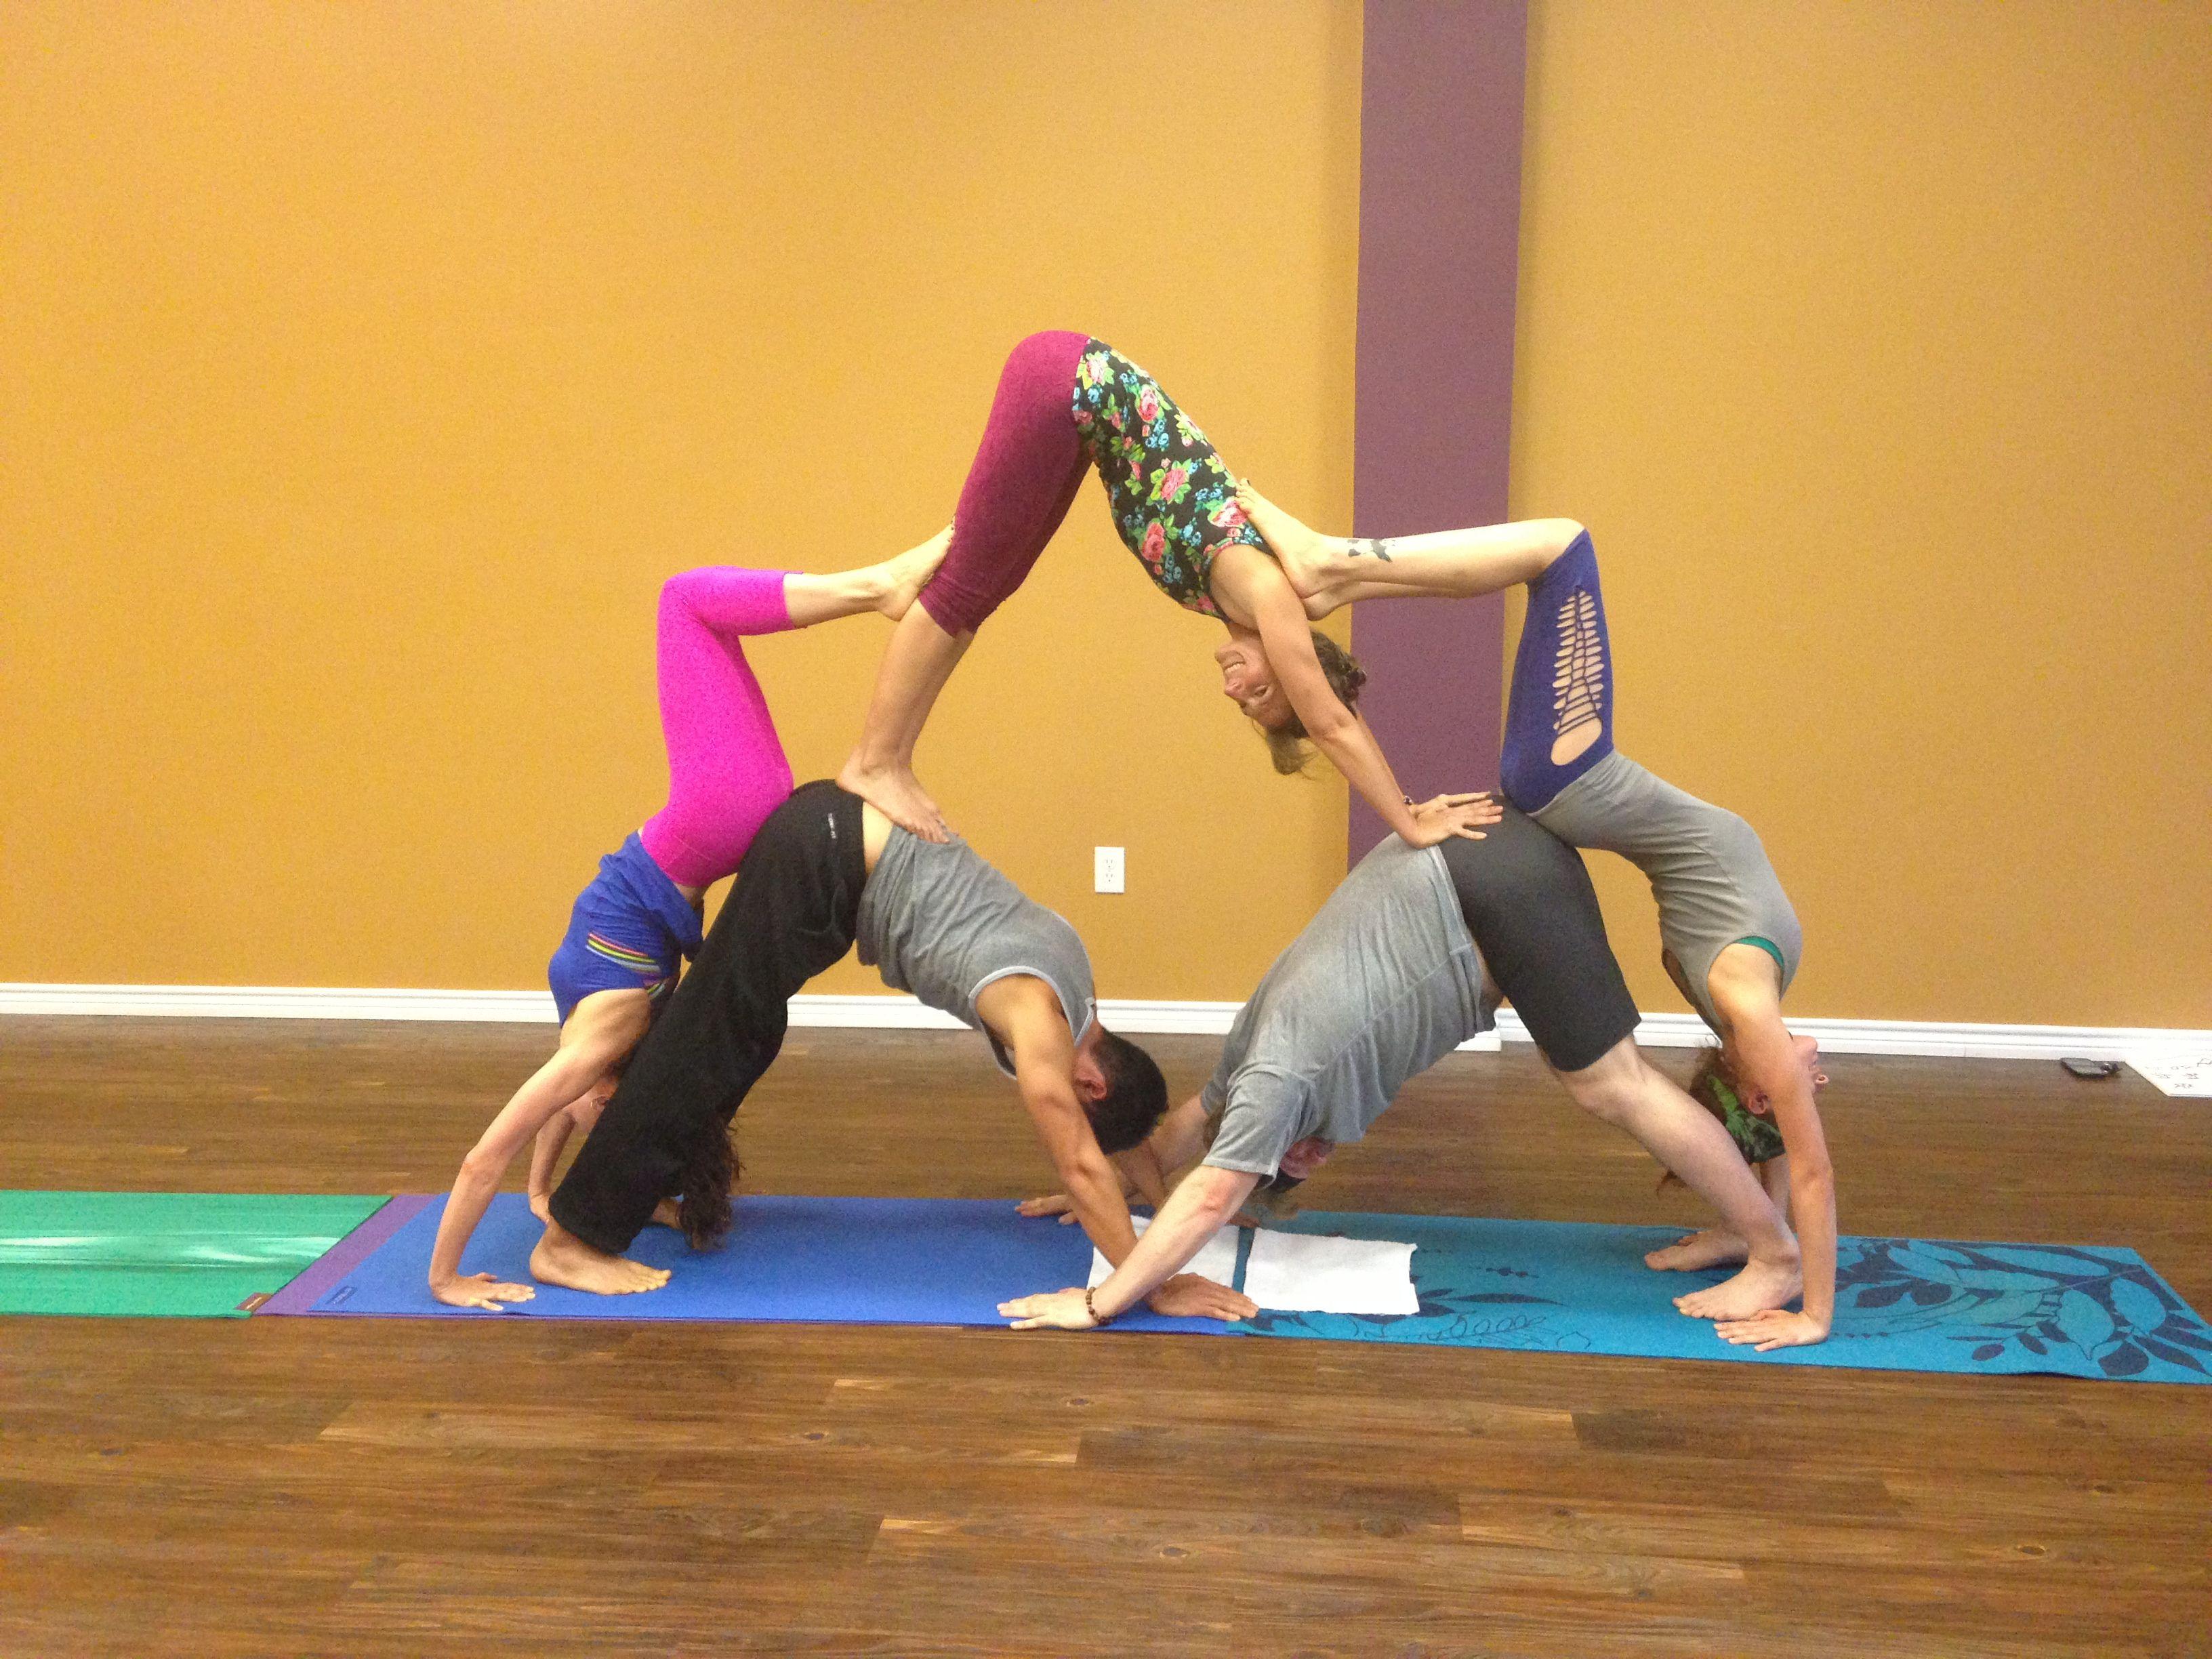 Yoga Poses 46 People  ABC News